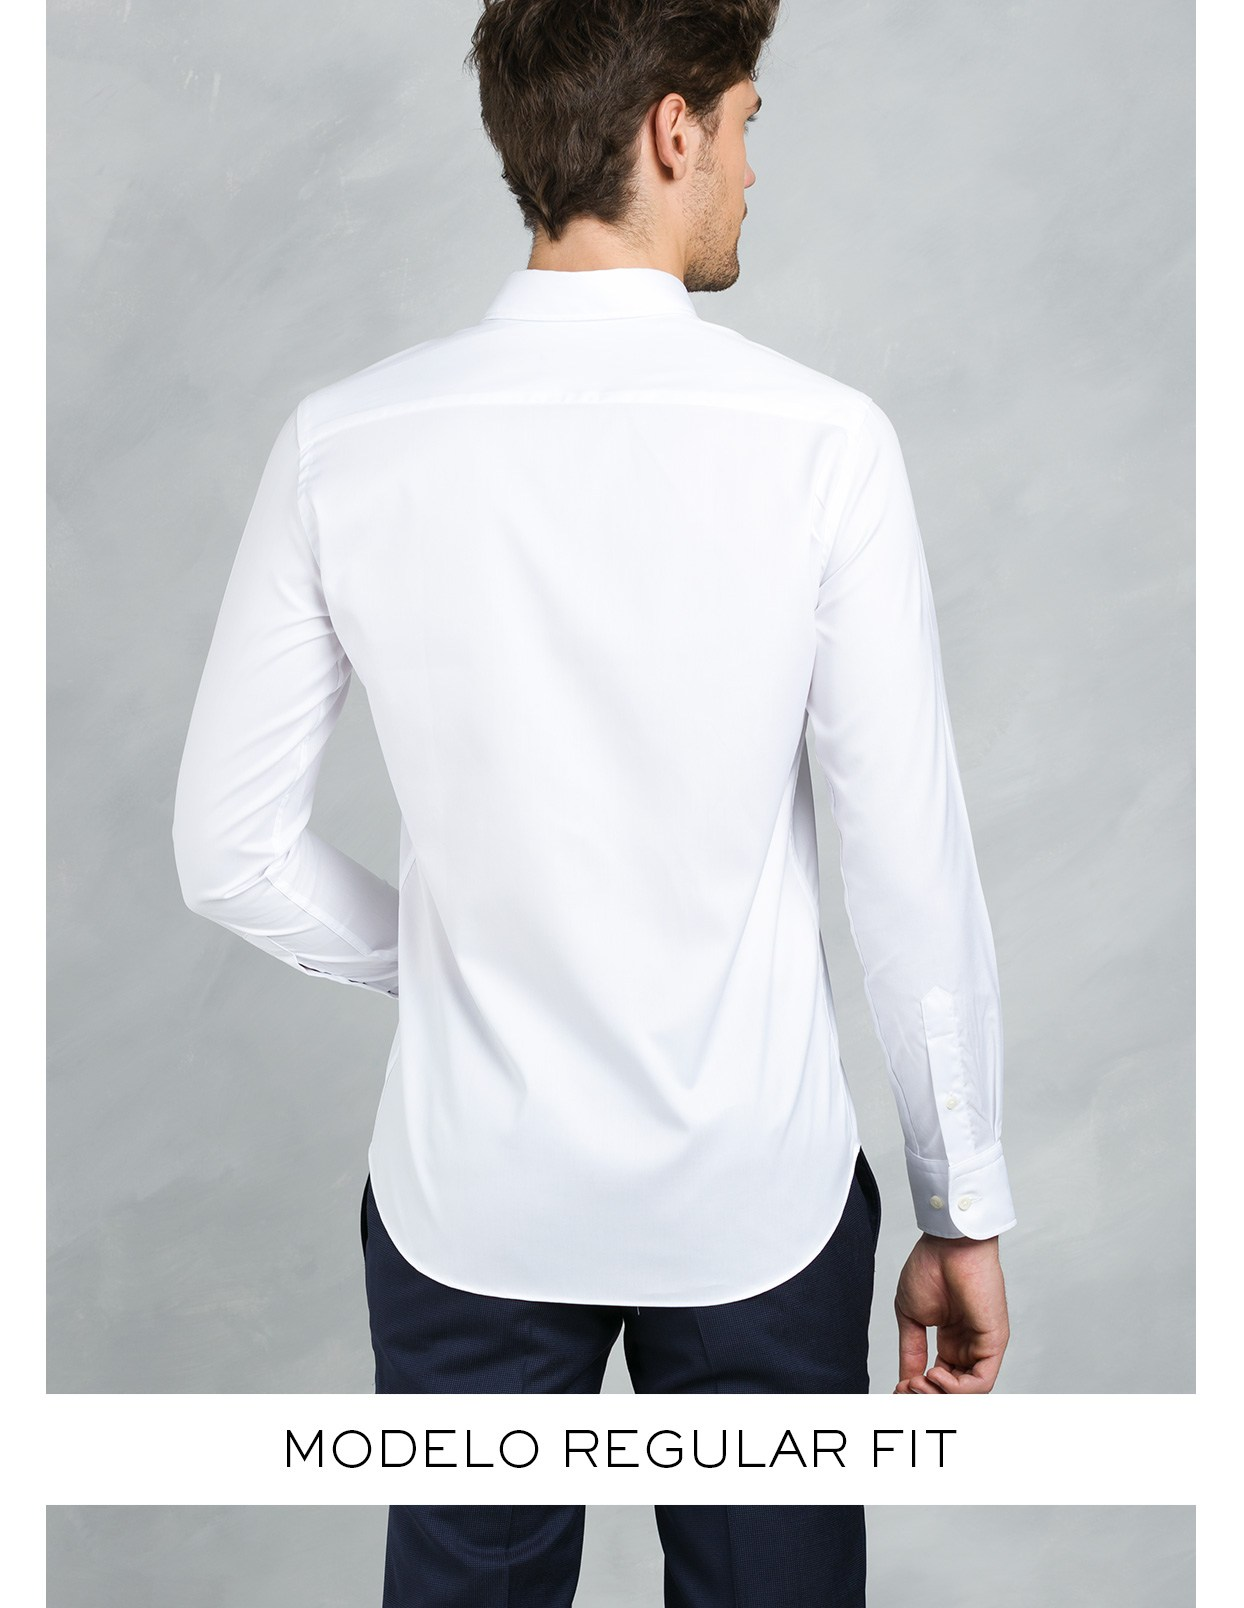 Camisa Formal Wear REGULAR FIT modelo BOTTON DOWN color azul , 100% Algodón. - Ítem2